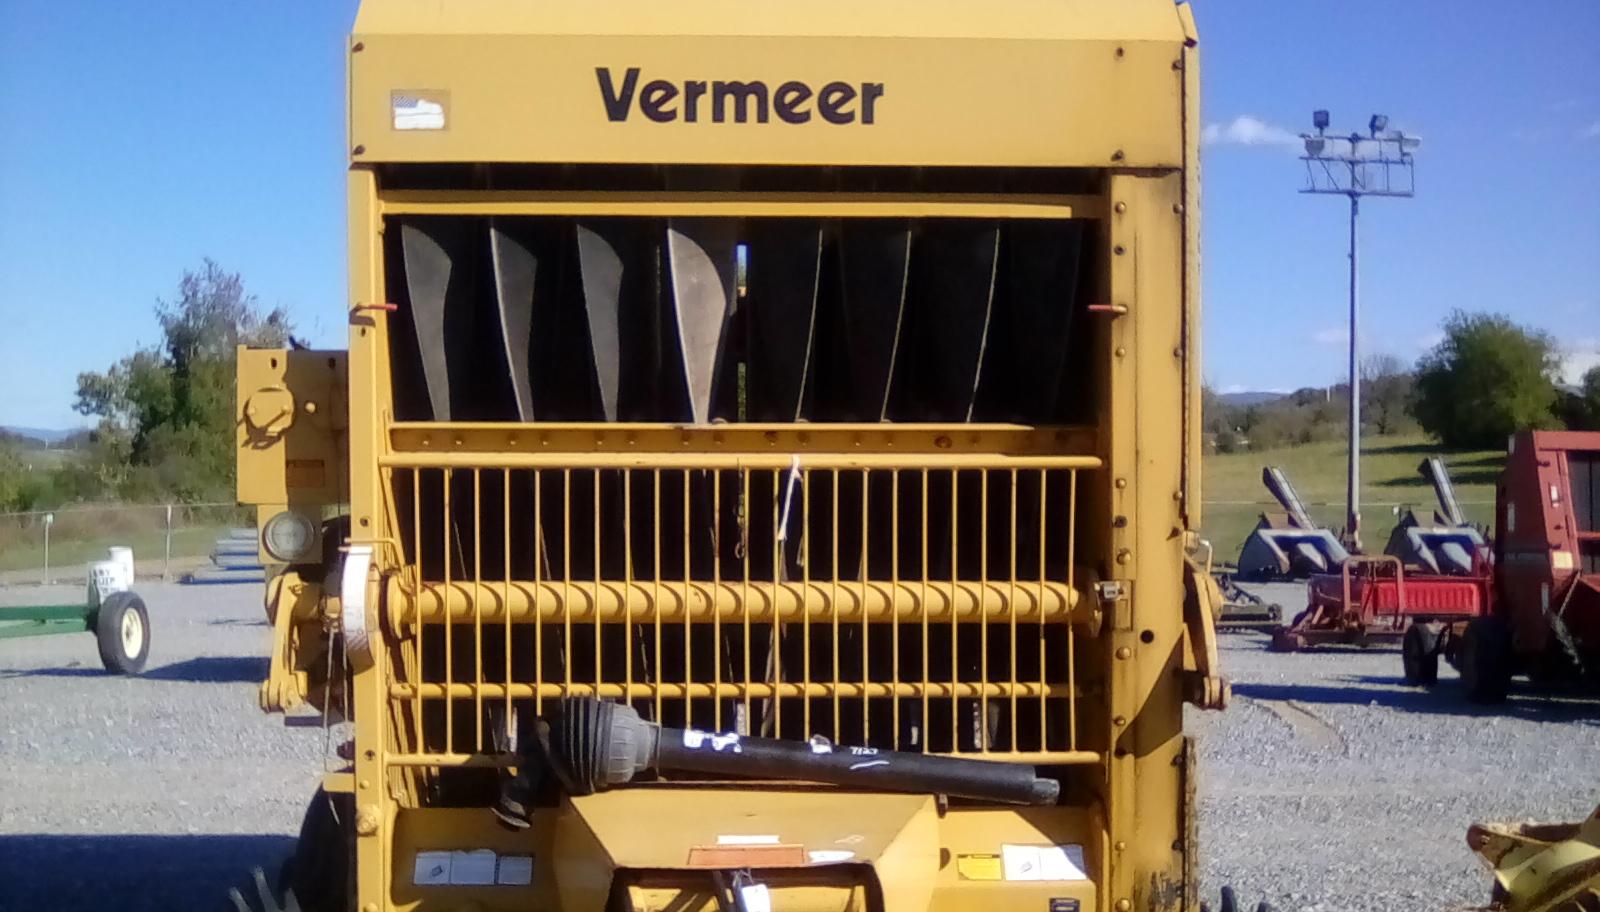 VERMEER 605 SUPER J ROUND BALER Image